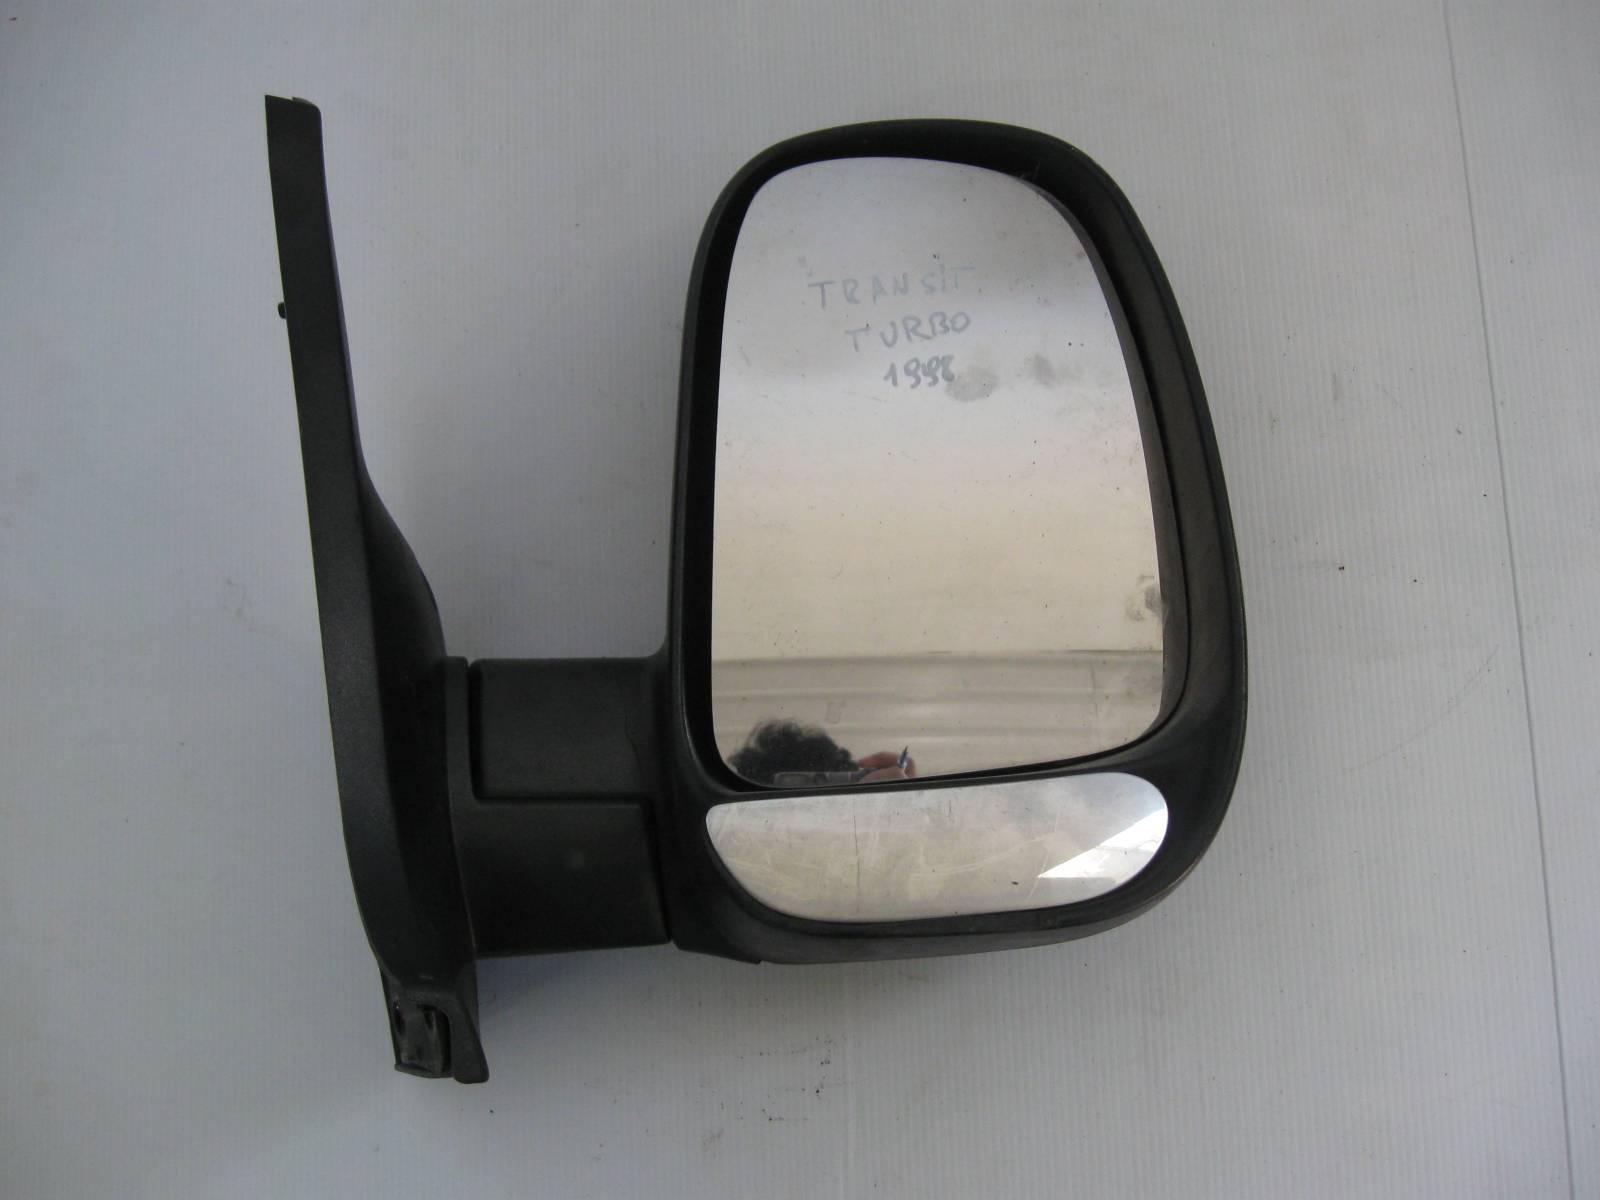 Форд транзит крышка правого зеркала 94 00 27 фотография